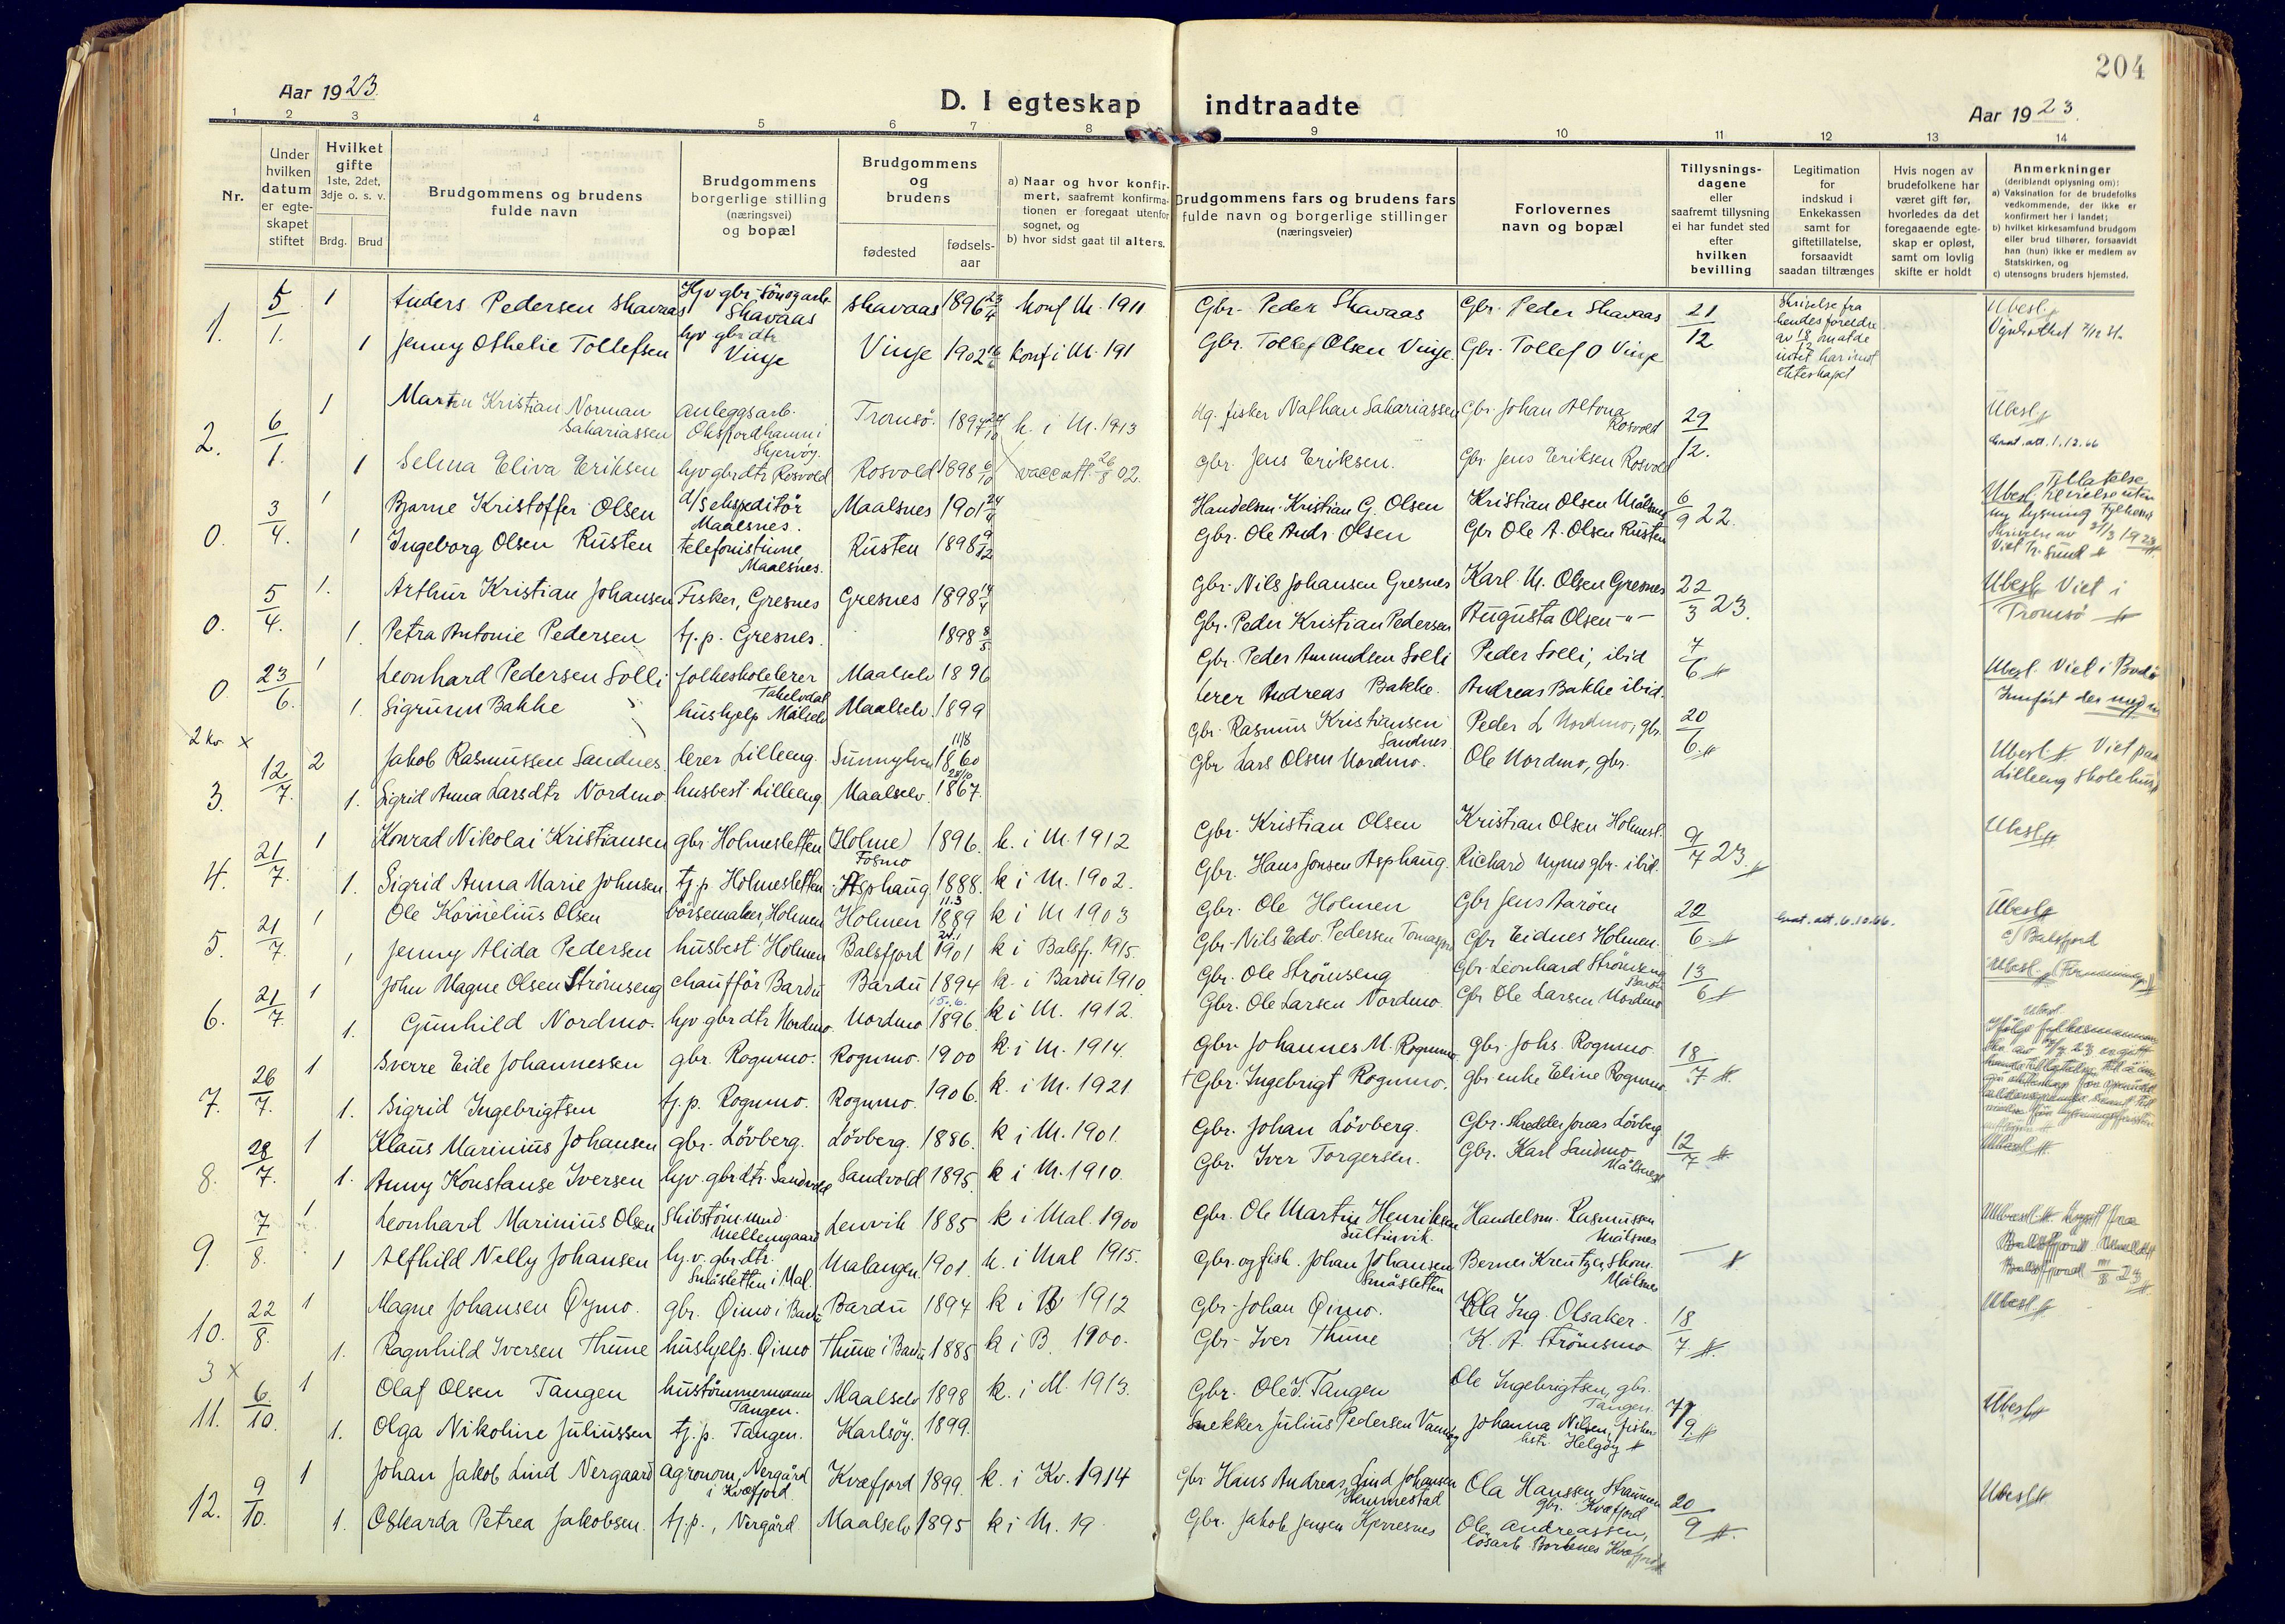 SATØ, Målselv sokneprestembete, Ministerialbok nr. 14, 1919-1932, s. 204